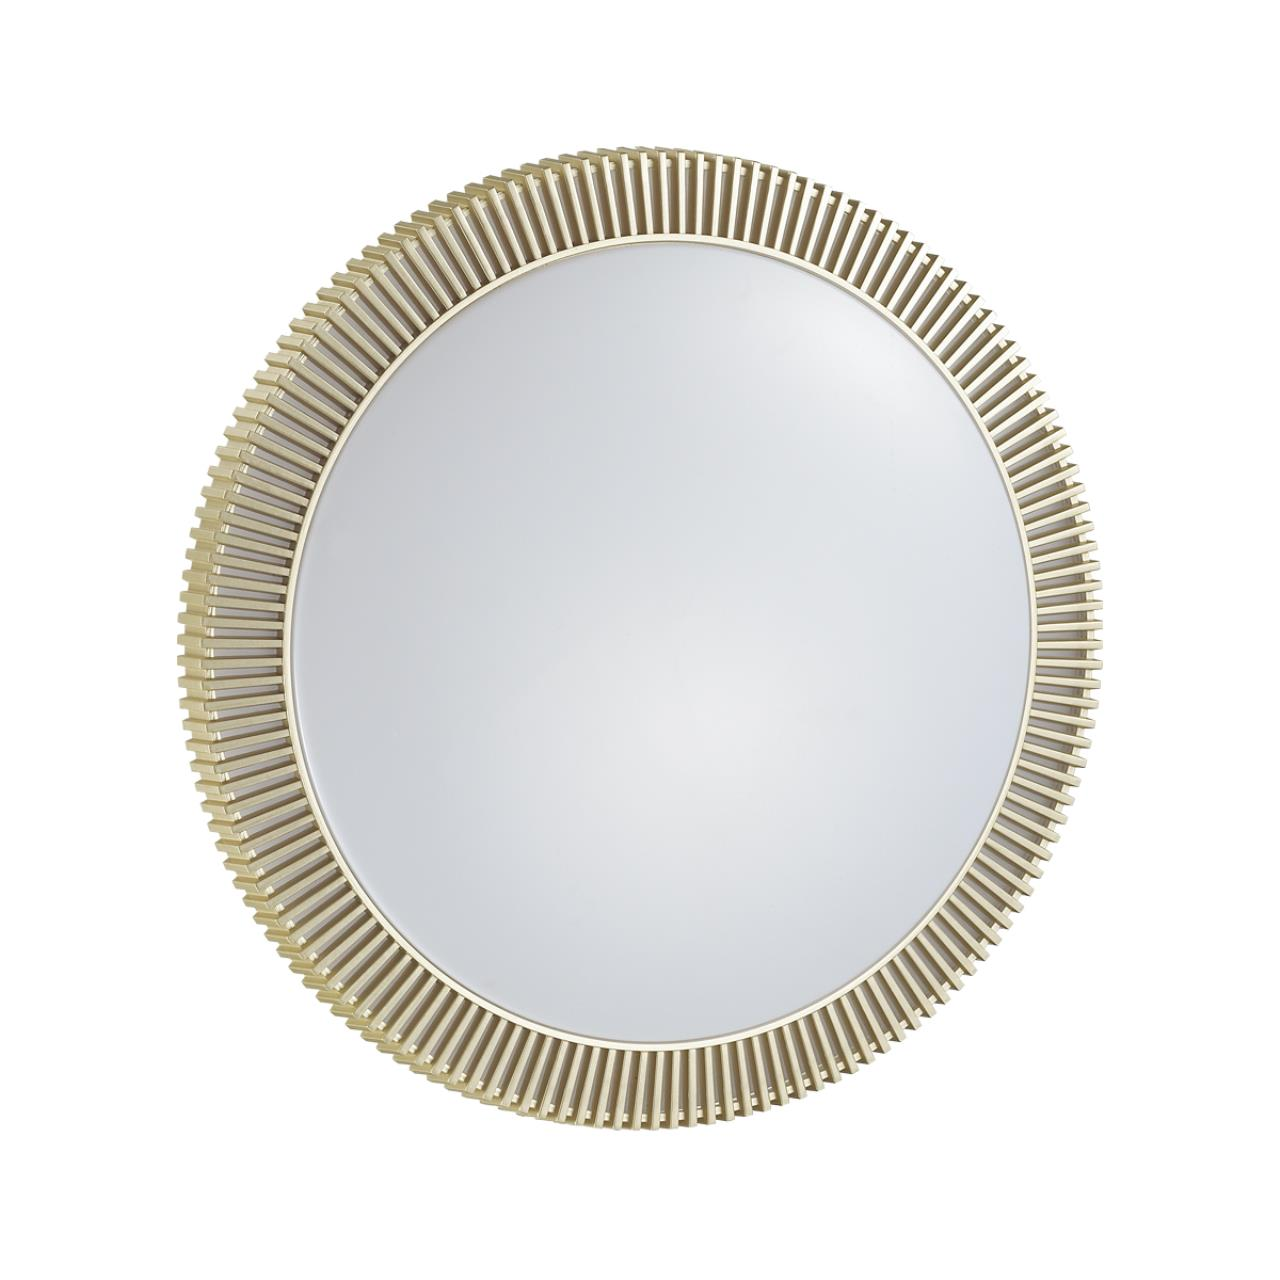 3032/DL SN 026 св-к LERBA GOLD пластик LED 48Вт 3000-6000K D400 IP43 пульт ДУ